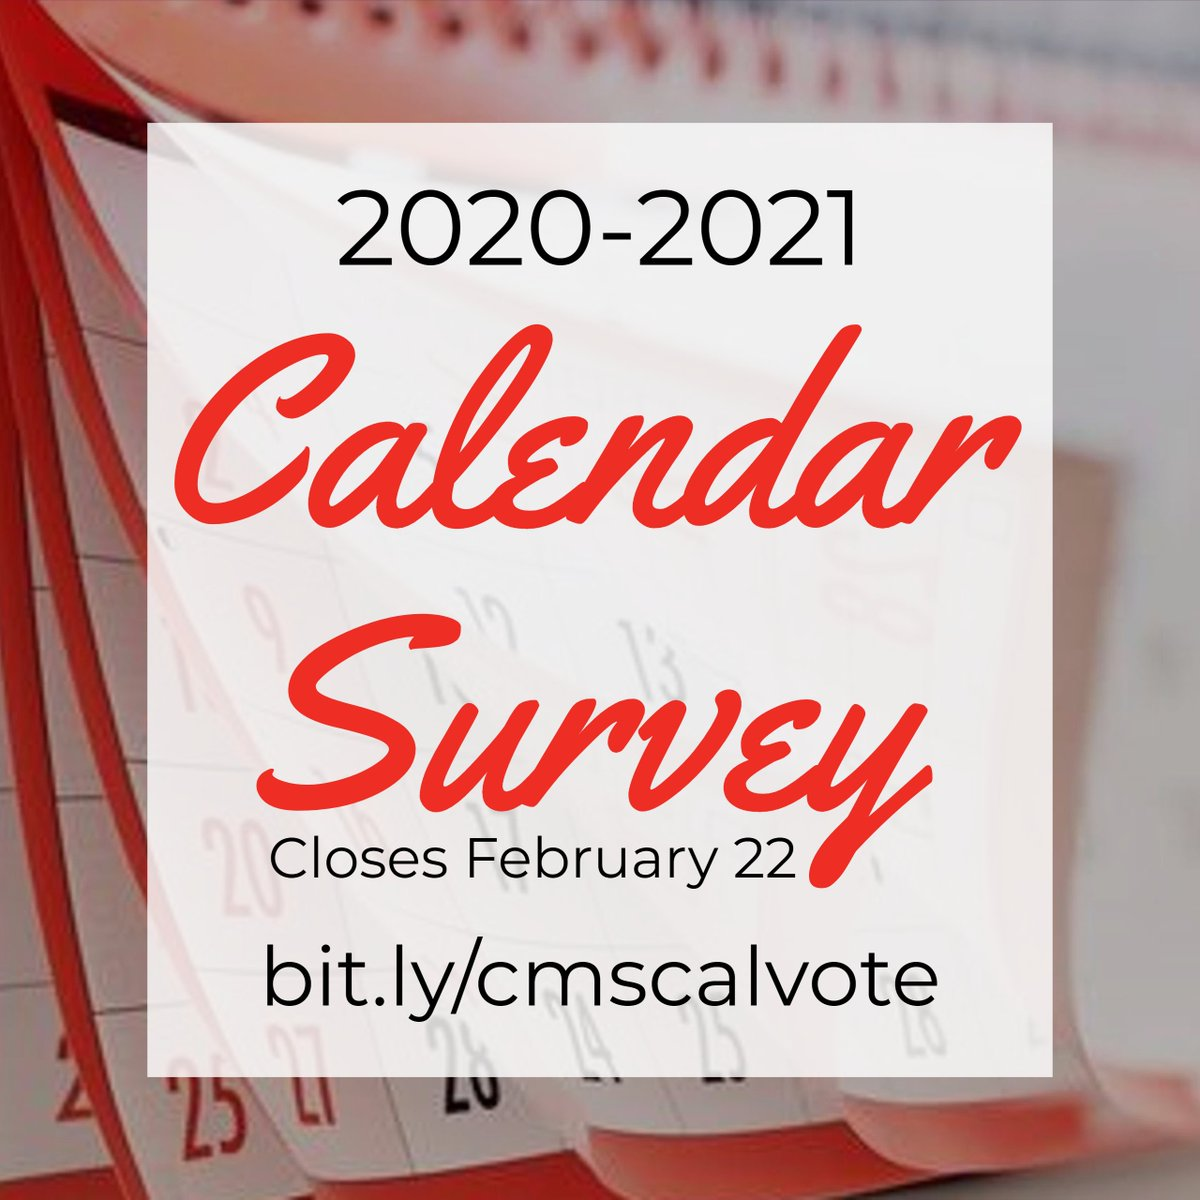 Cms Calendar 2020-21 CMS on Twitter: